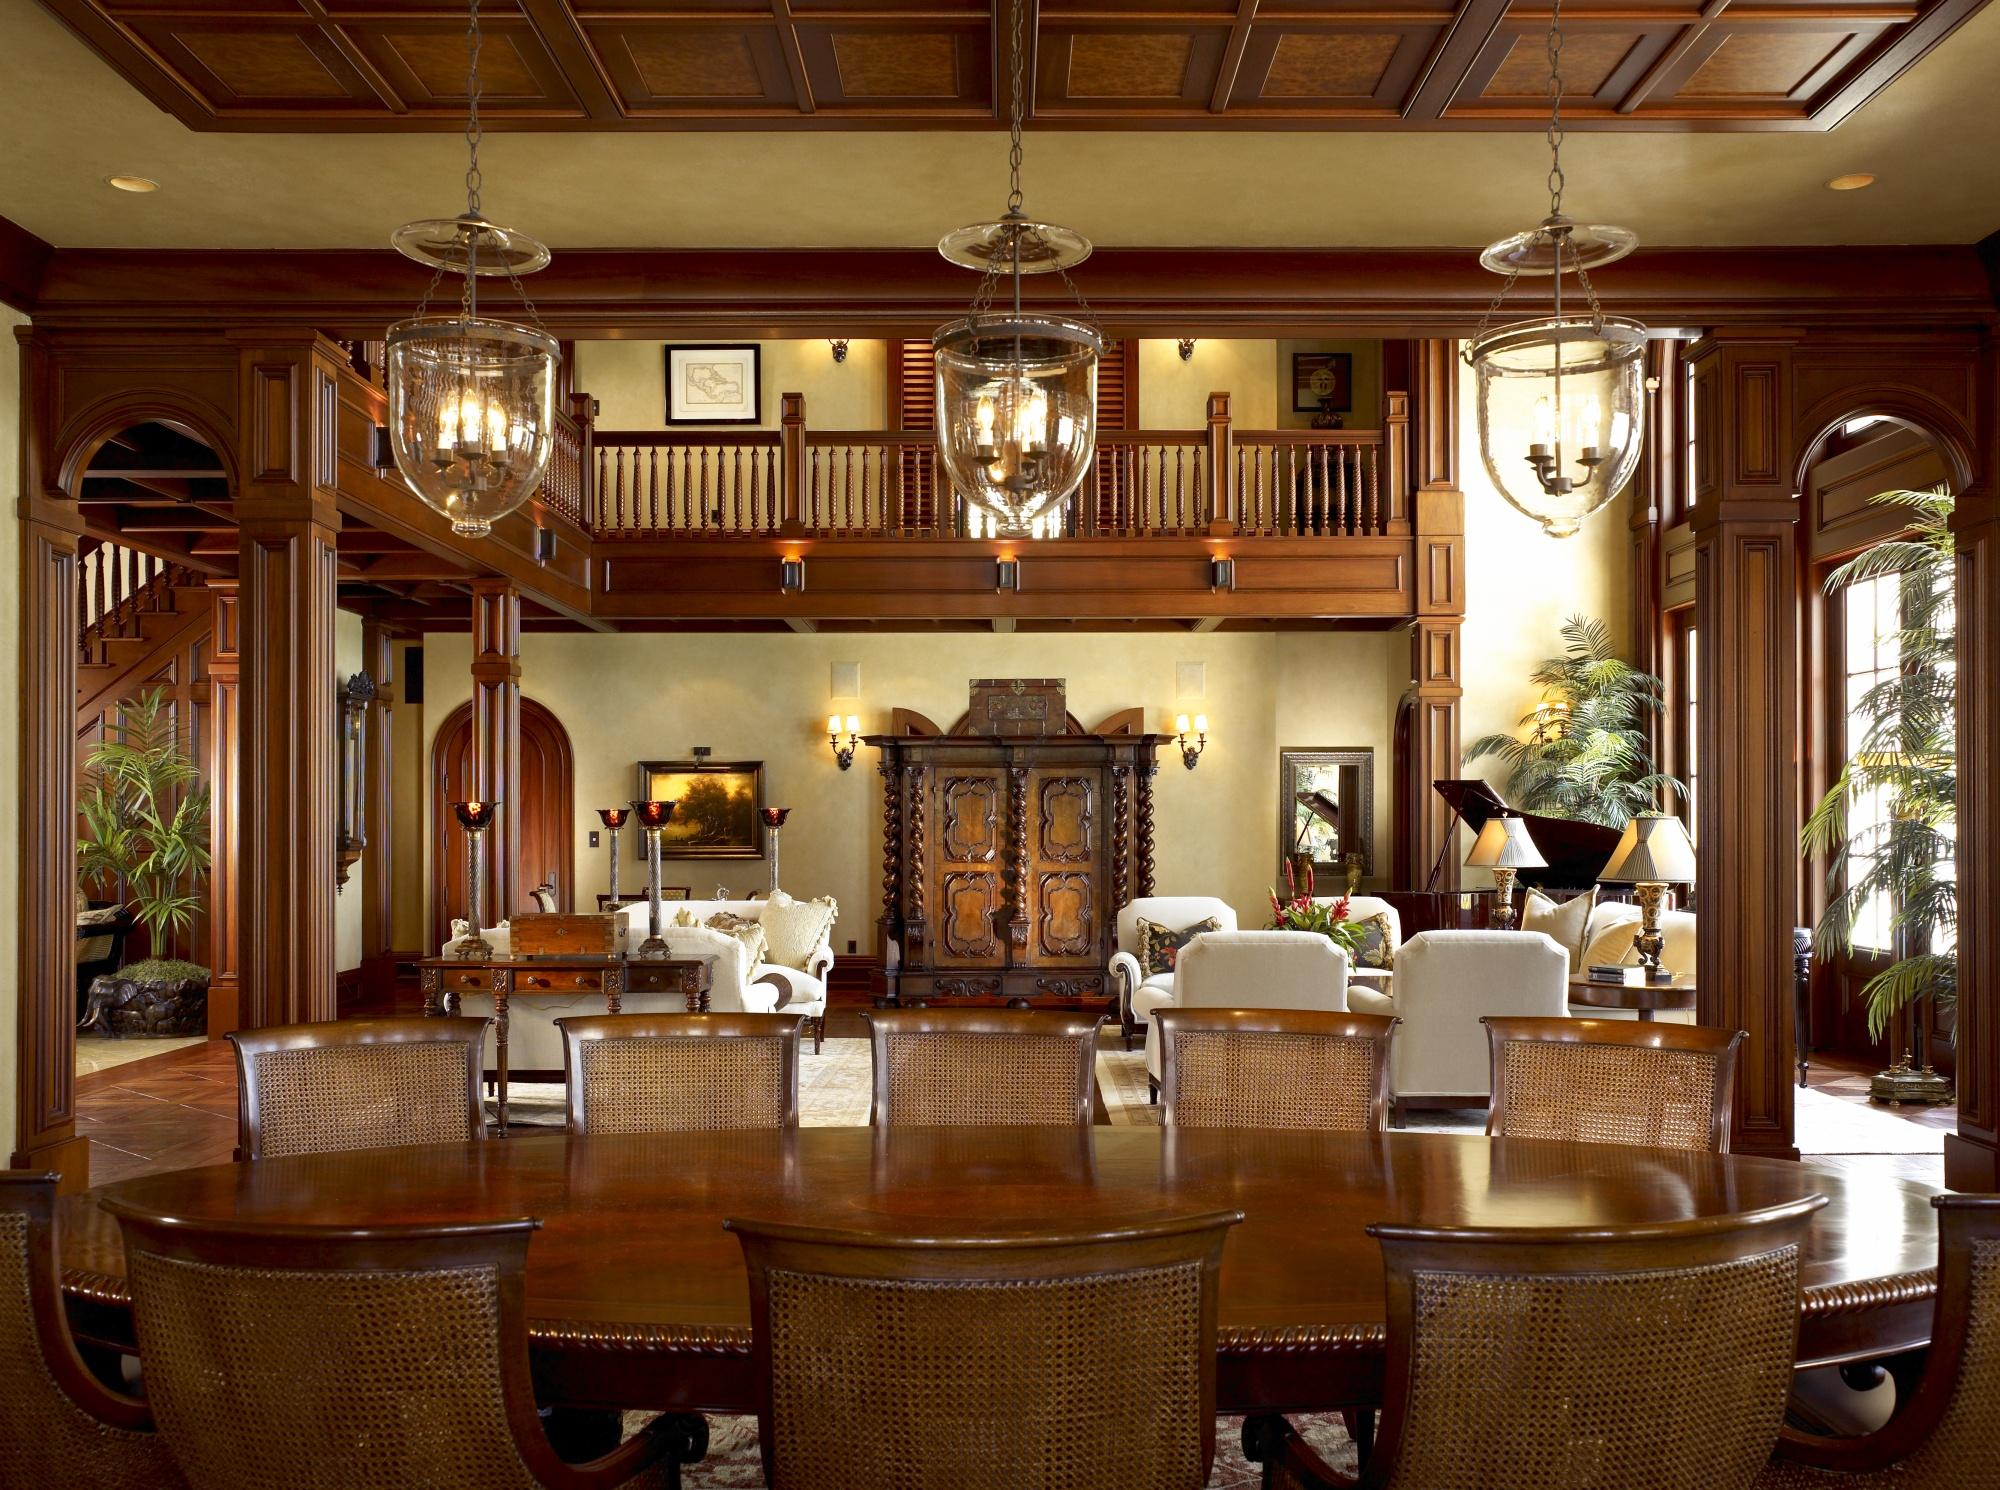 Venetian plaster and mahogany trim.